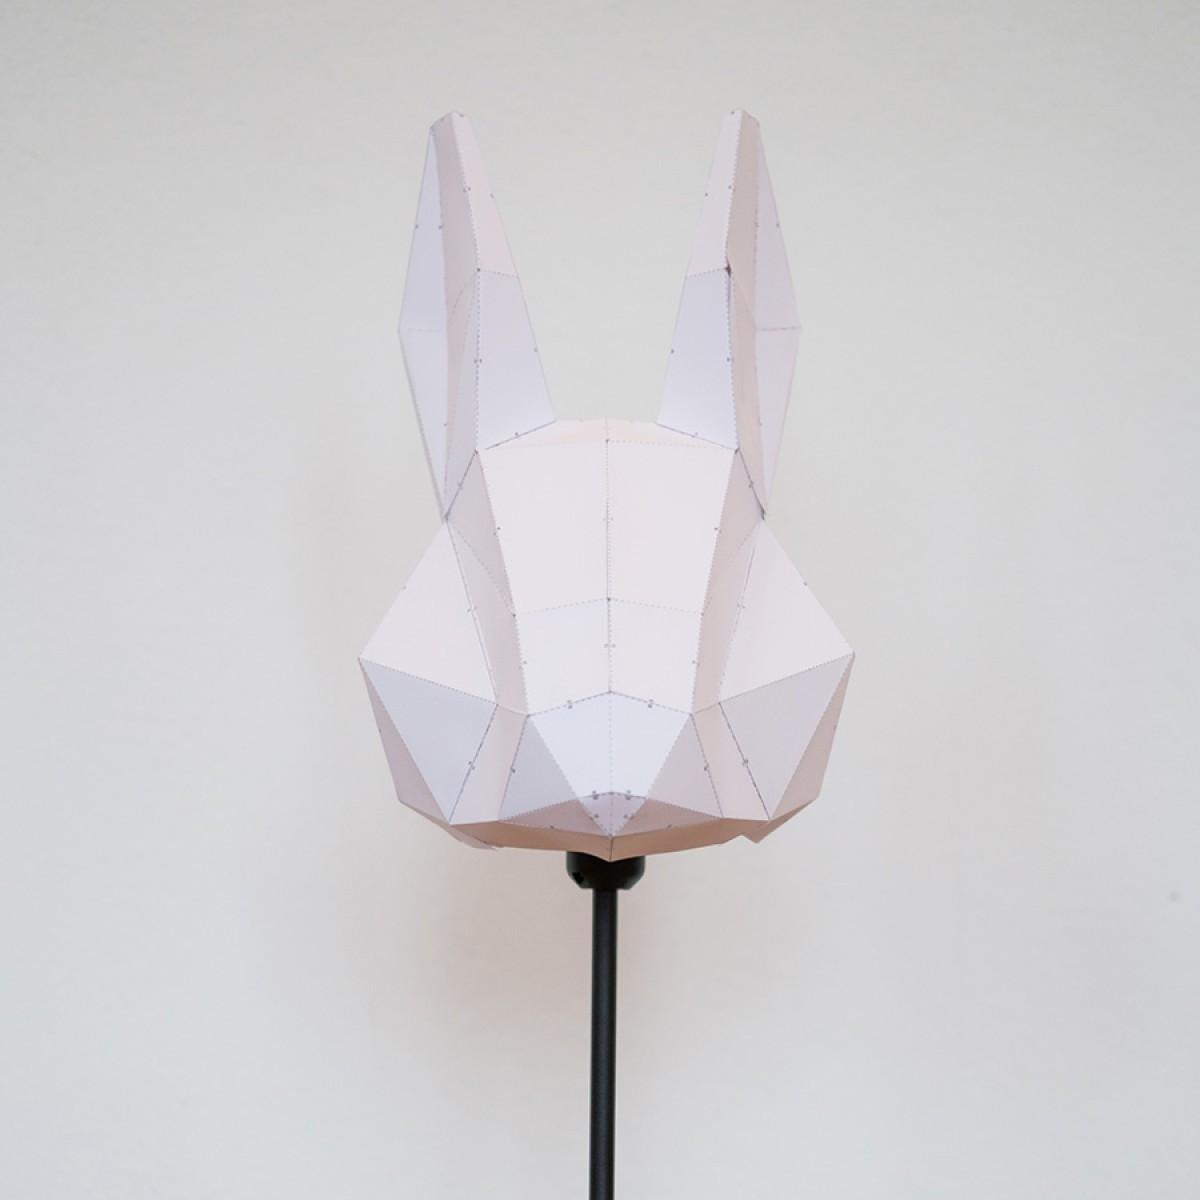 Rabbit Medium - Do It Yourself Papierlampenschirm